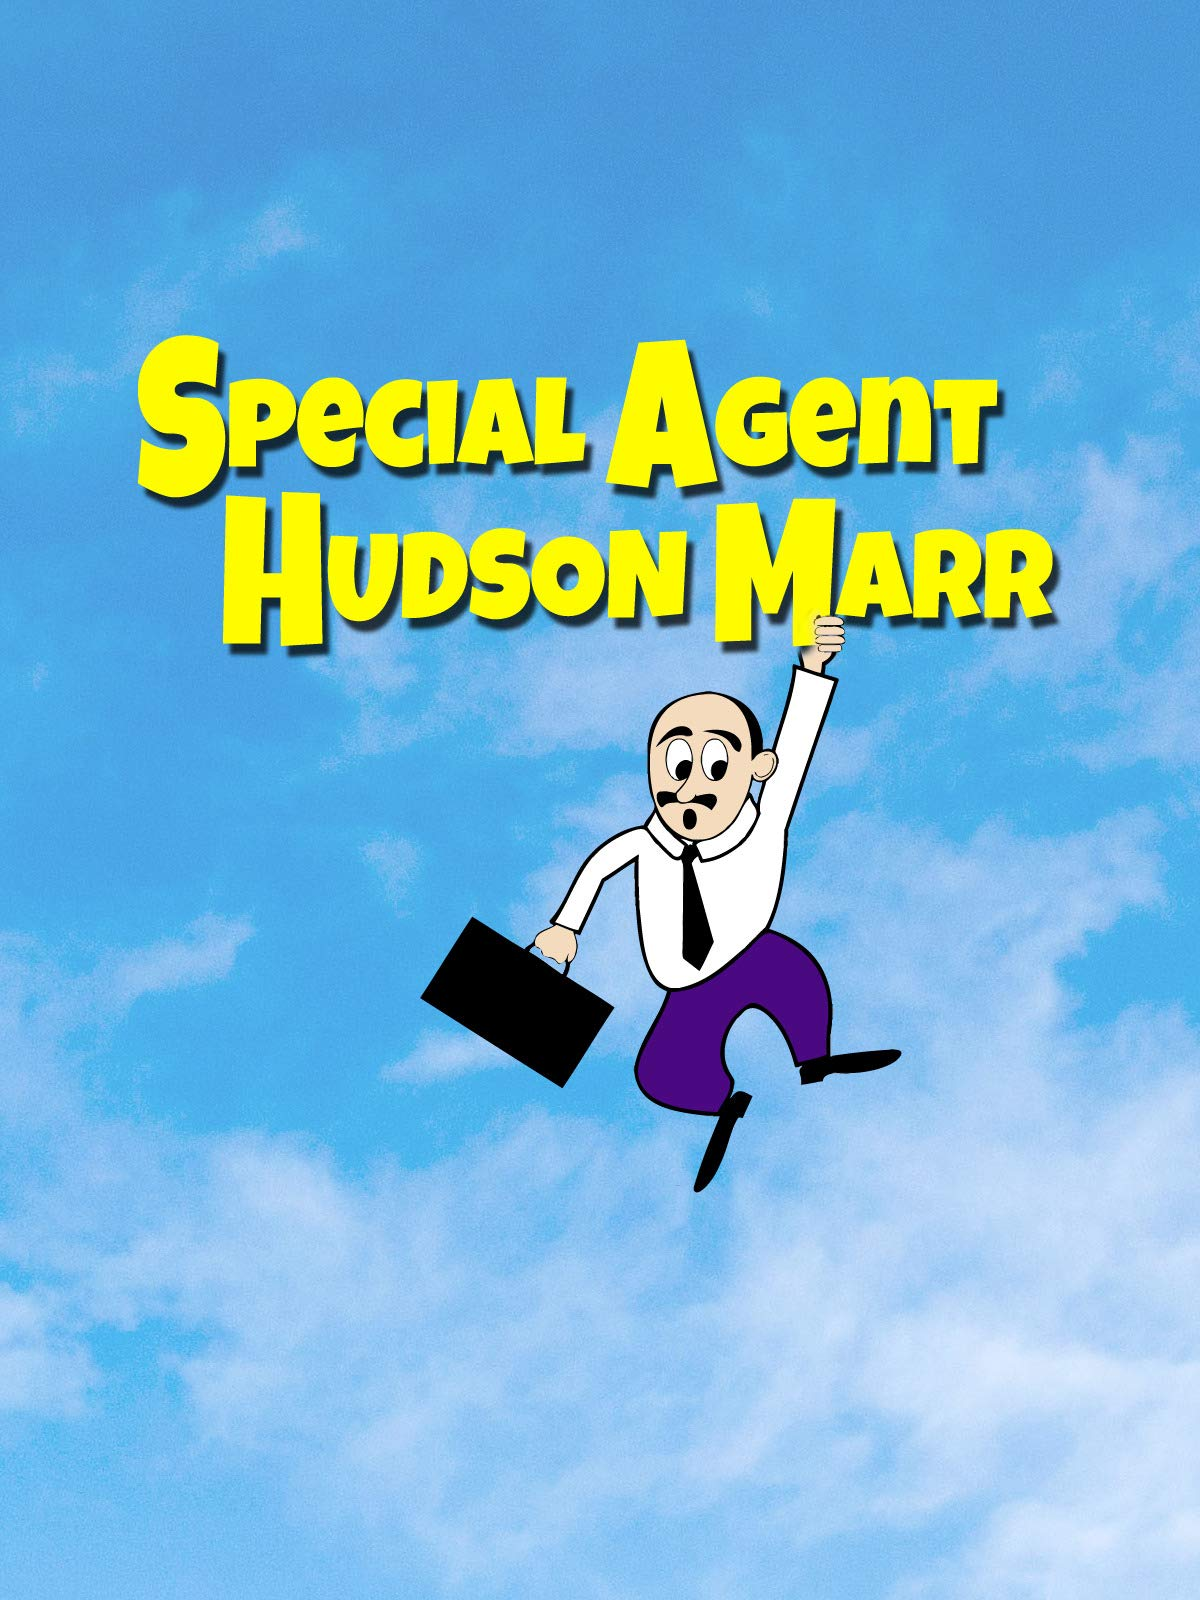 Special Agent Hudson Marr